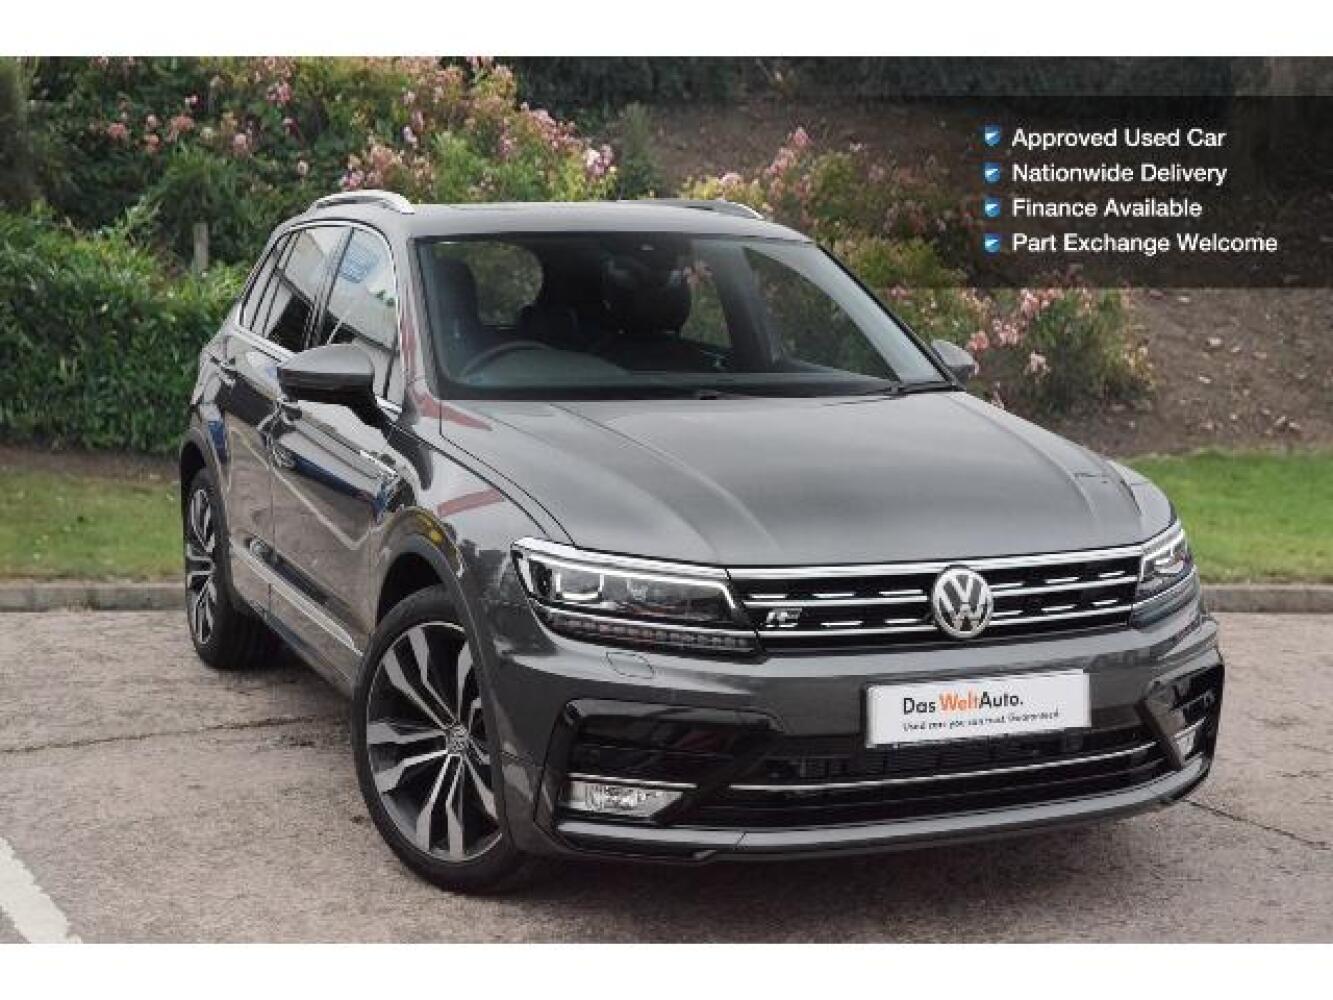 2018 Vw Tiguan The Stylish Suv Volkswagen Upcomingcarshq Com